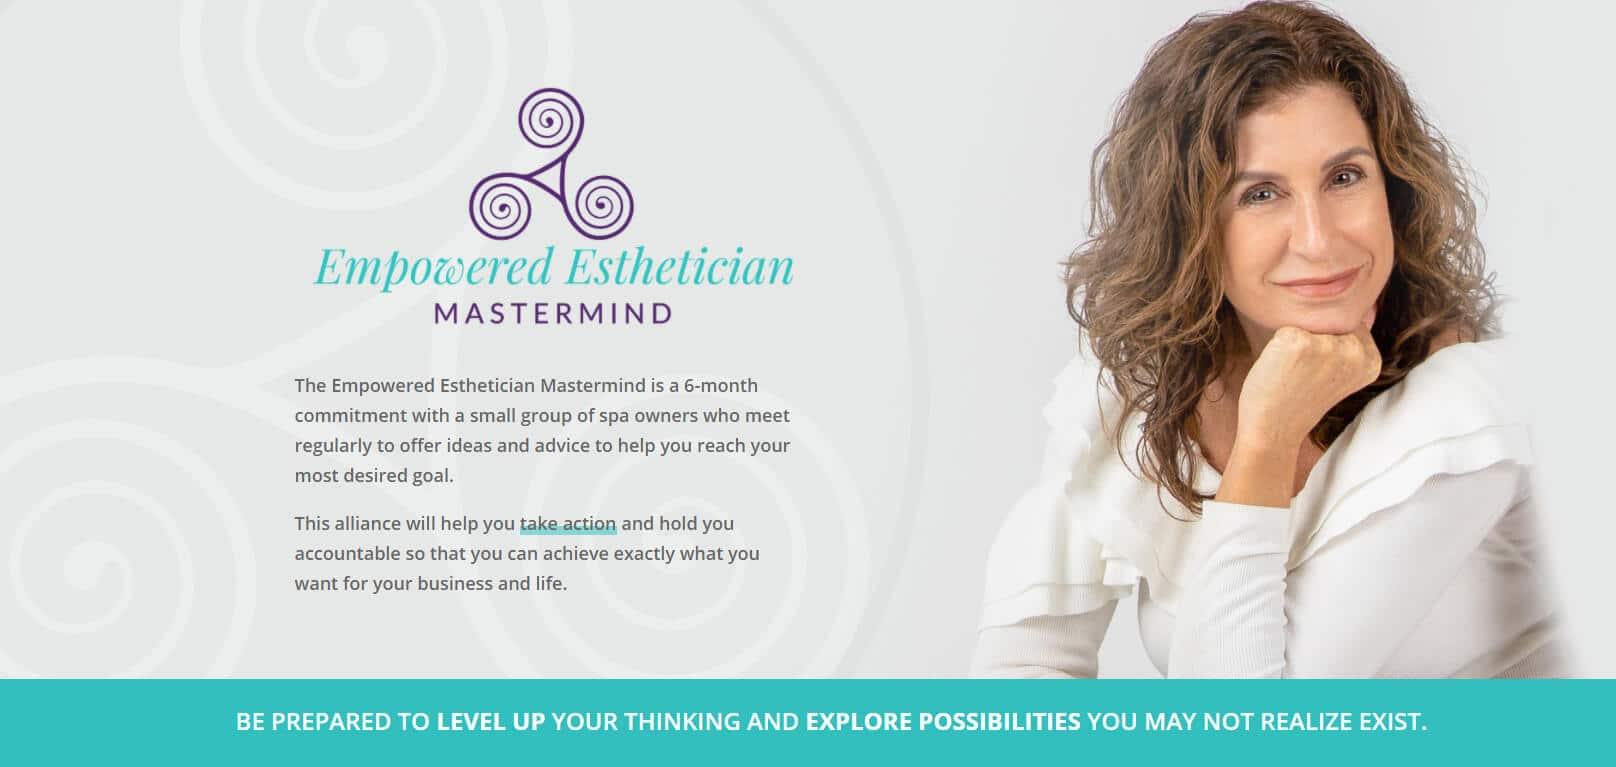 empowered esthetician mastermind maxine drake